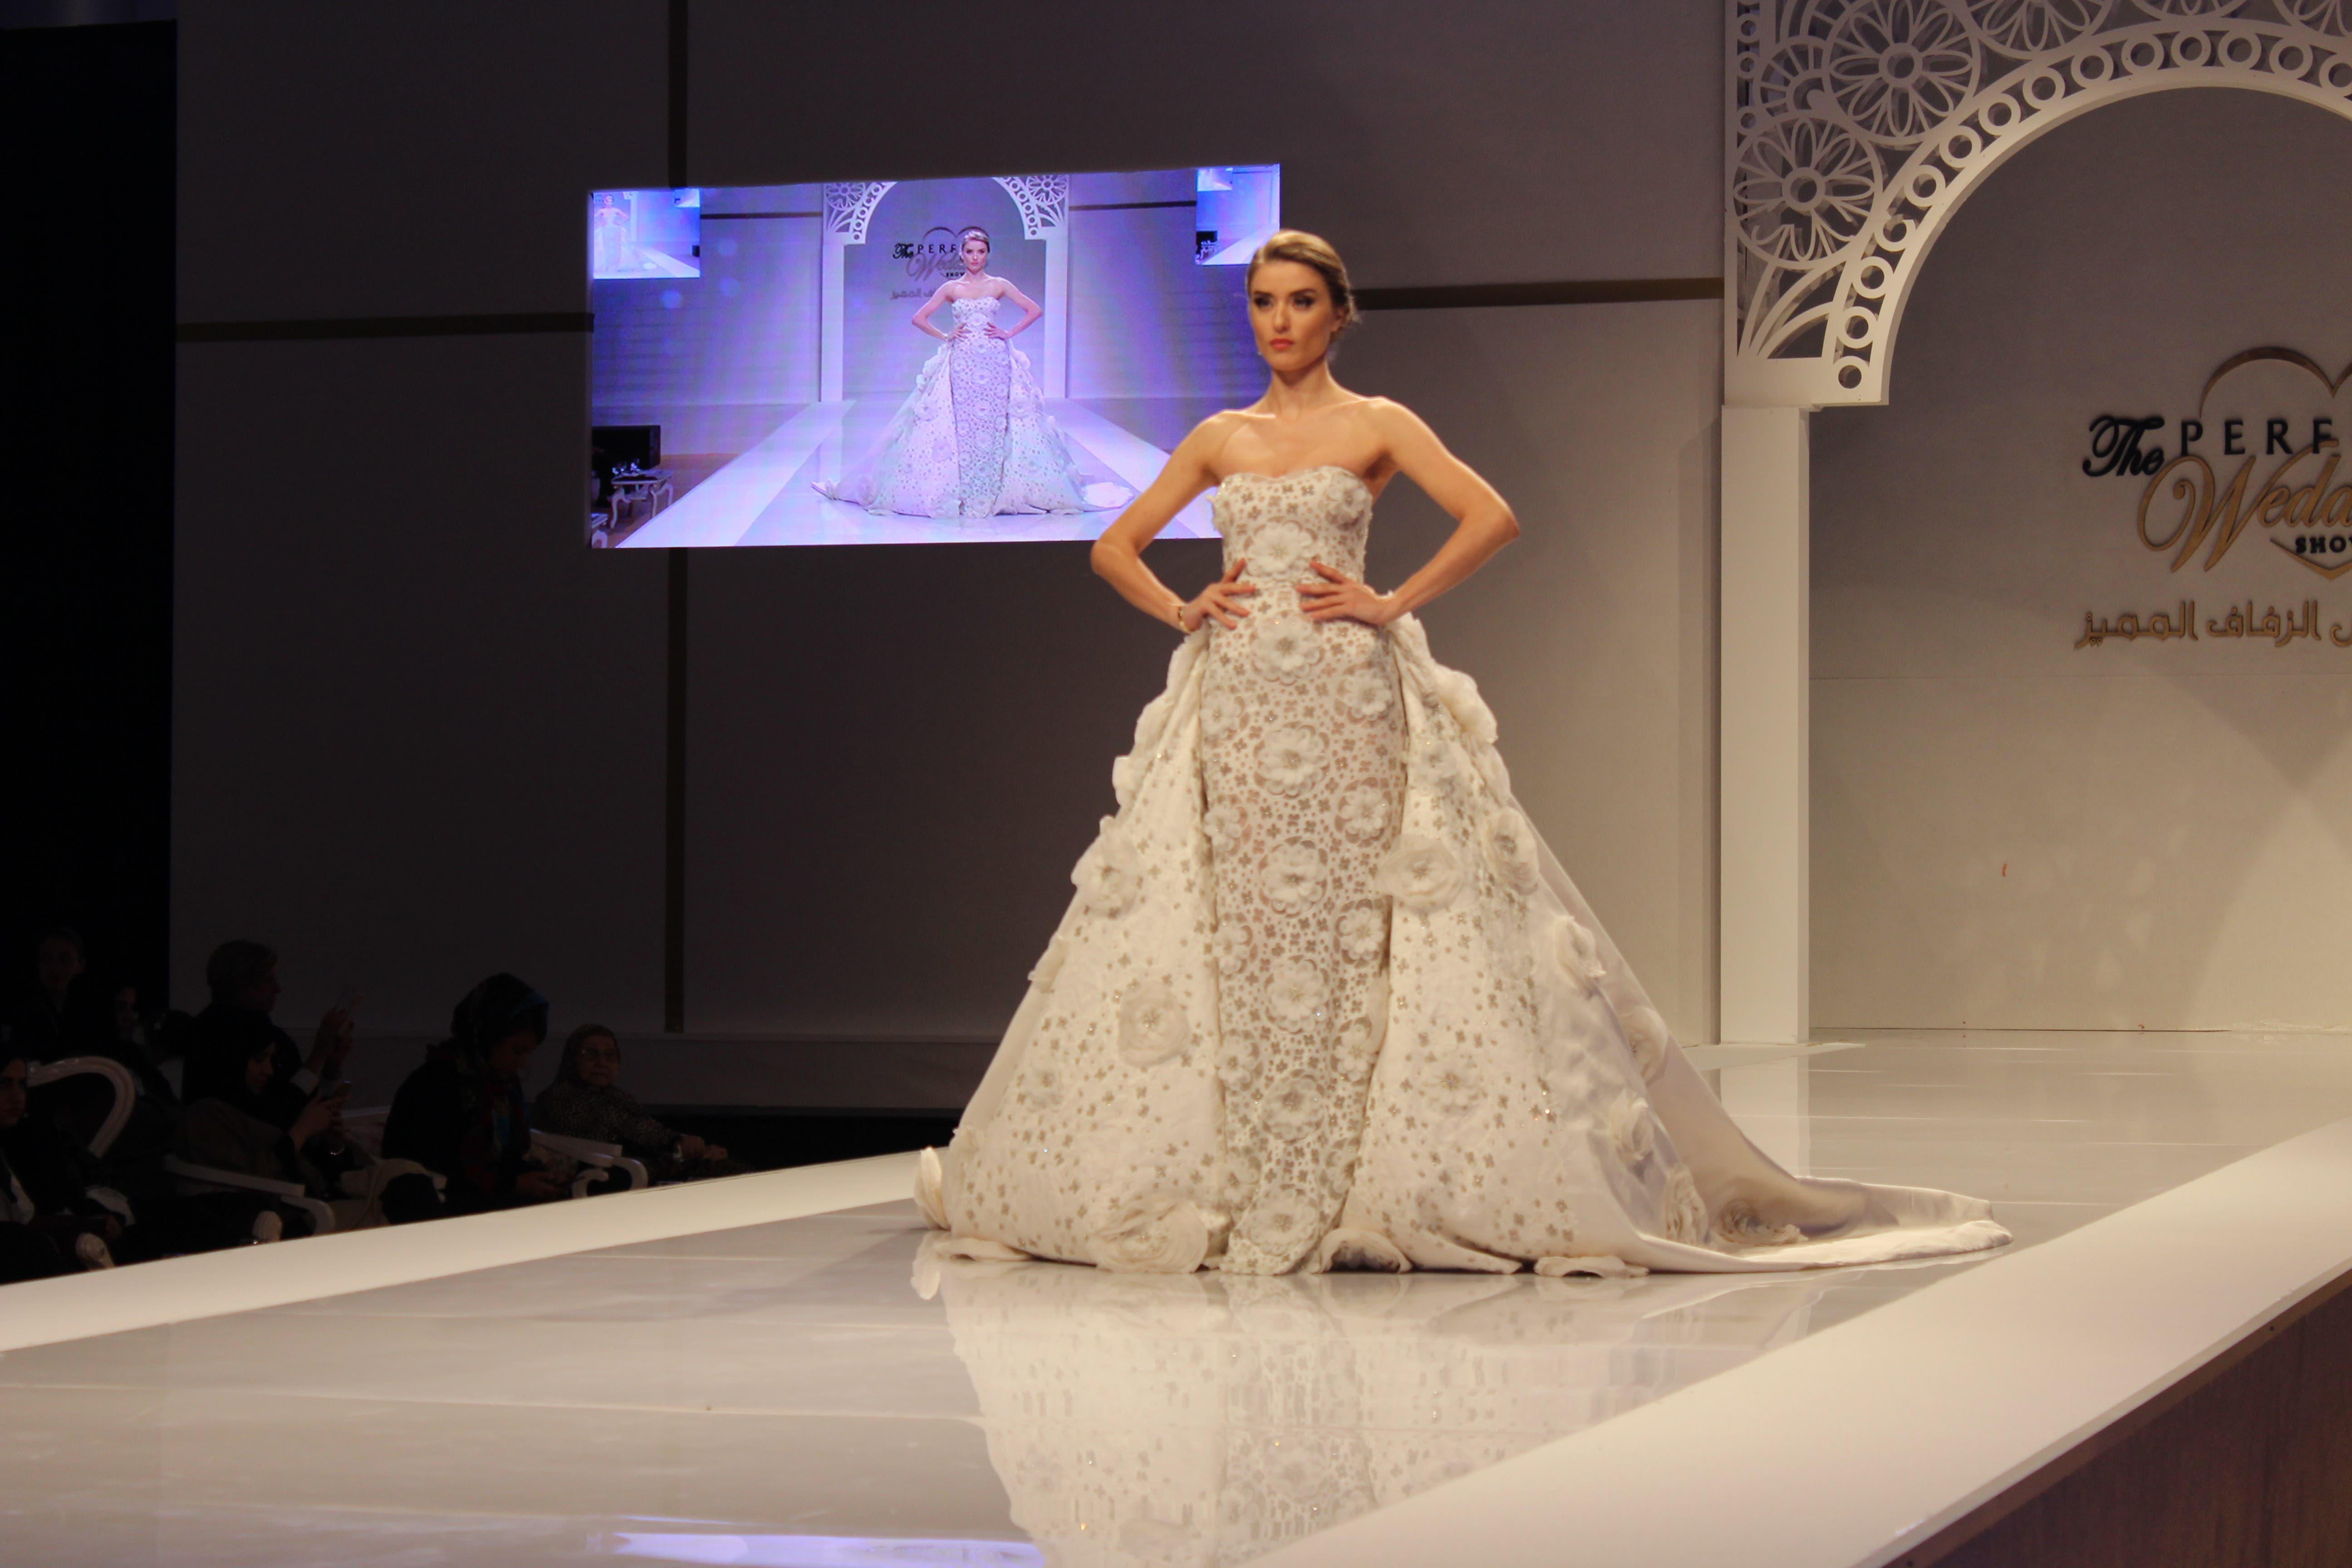 A display of Zakhem's bridal gowns at the Perfect Wedding Show. (Shounaz Meky/Al Arabiya News)